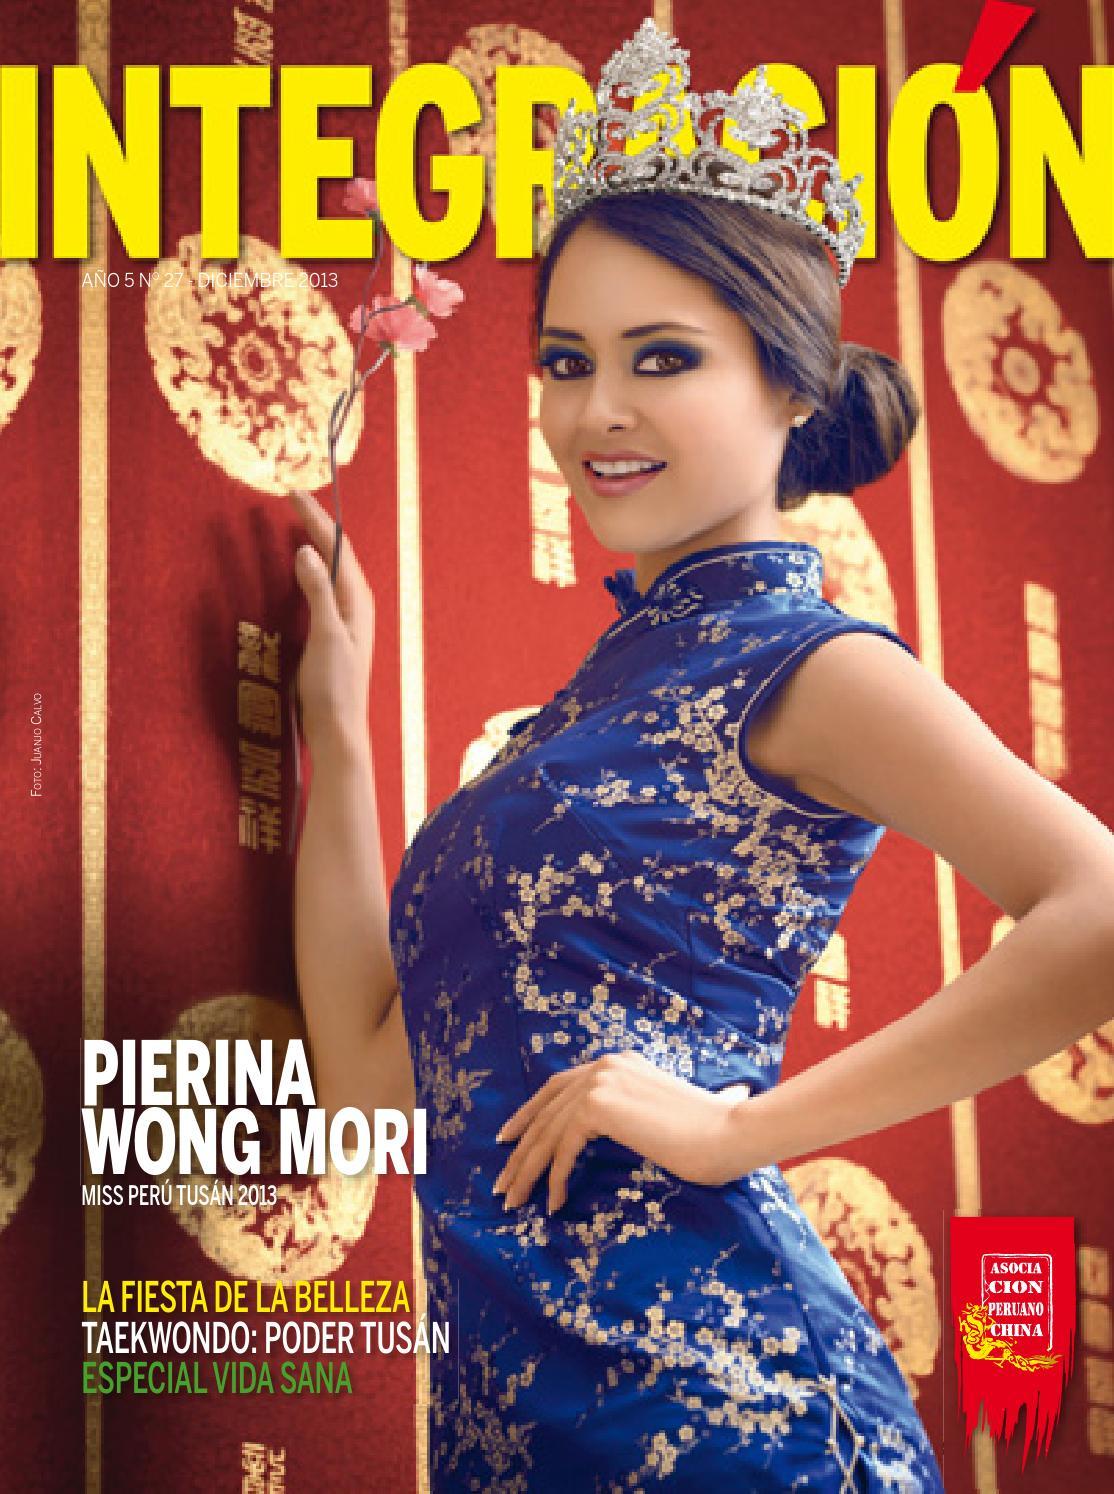 pierina sue wong mori, miss mundo peru 2016. - Página 2 7vayuwmd